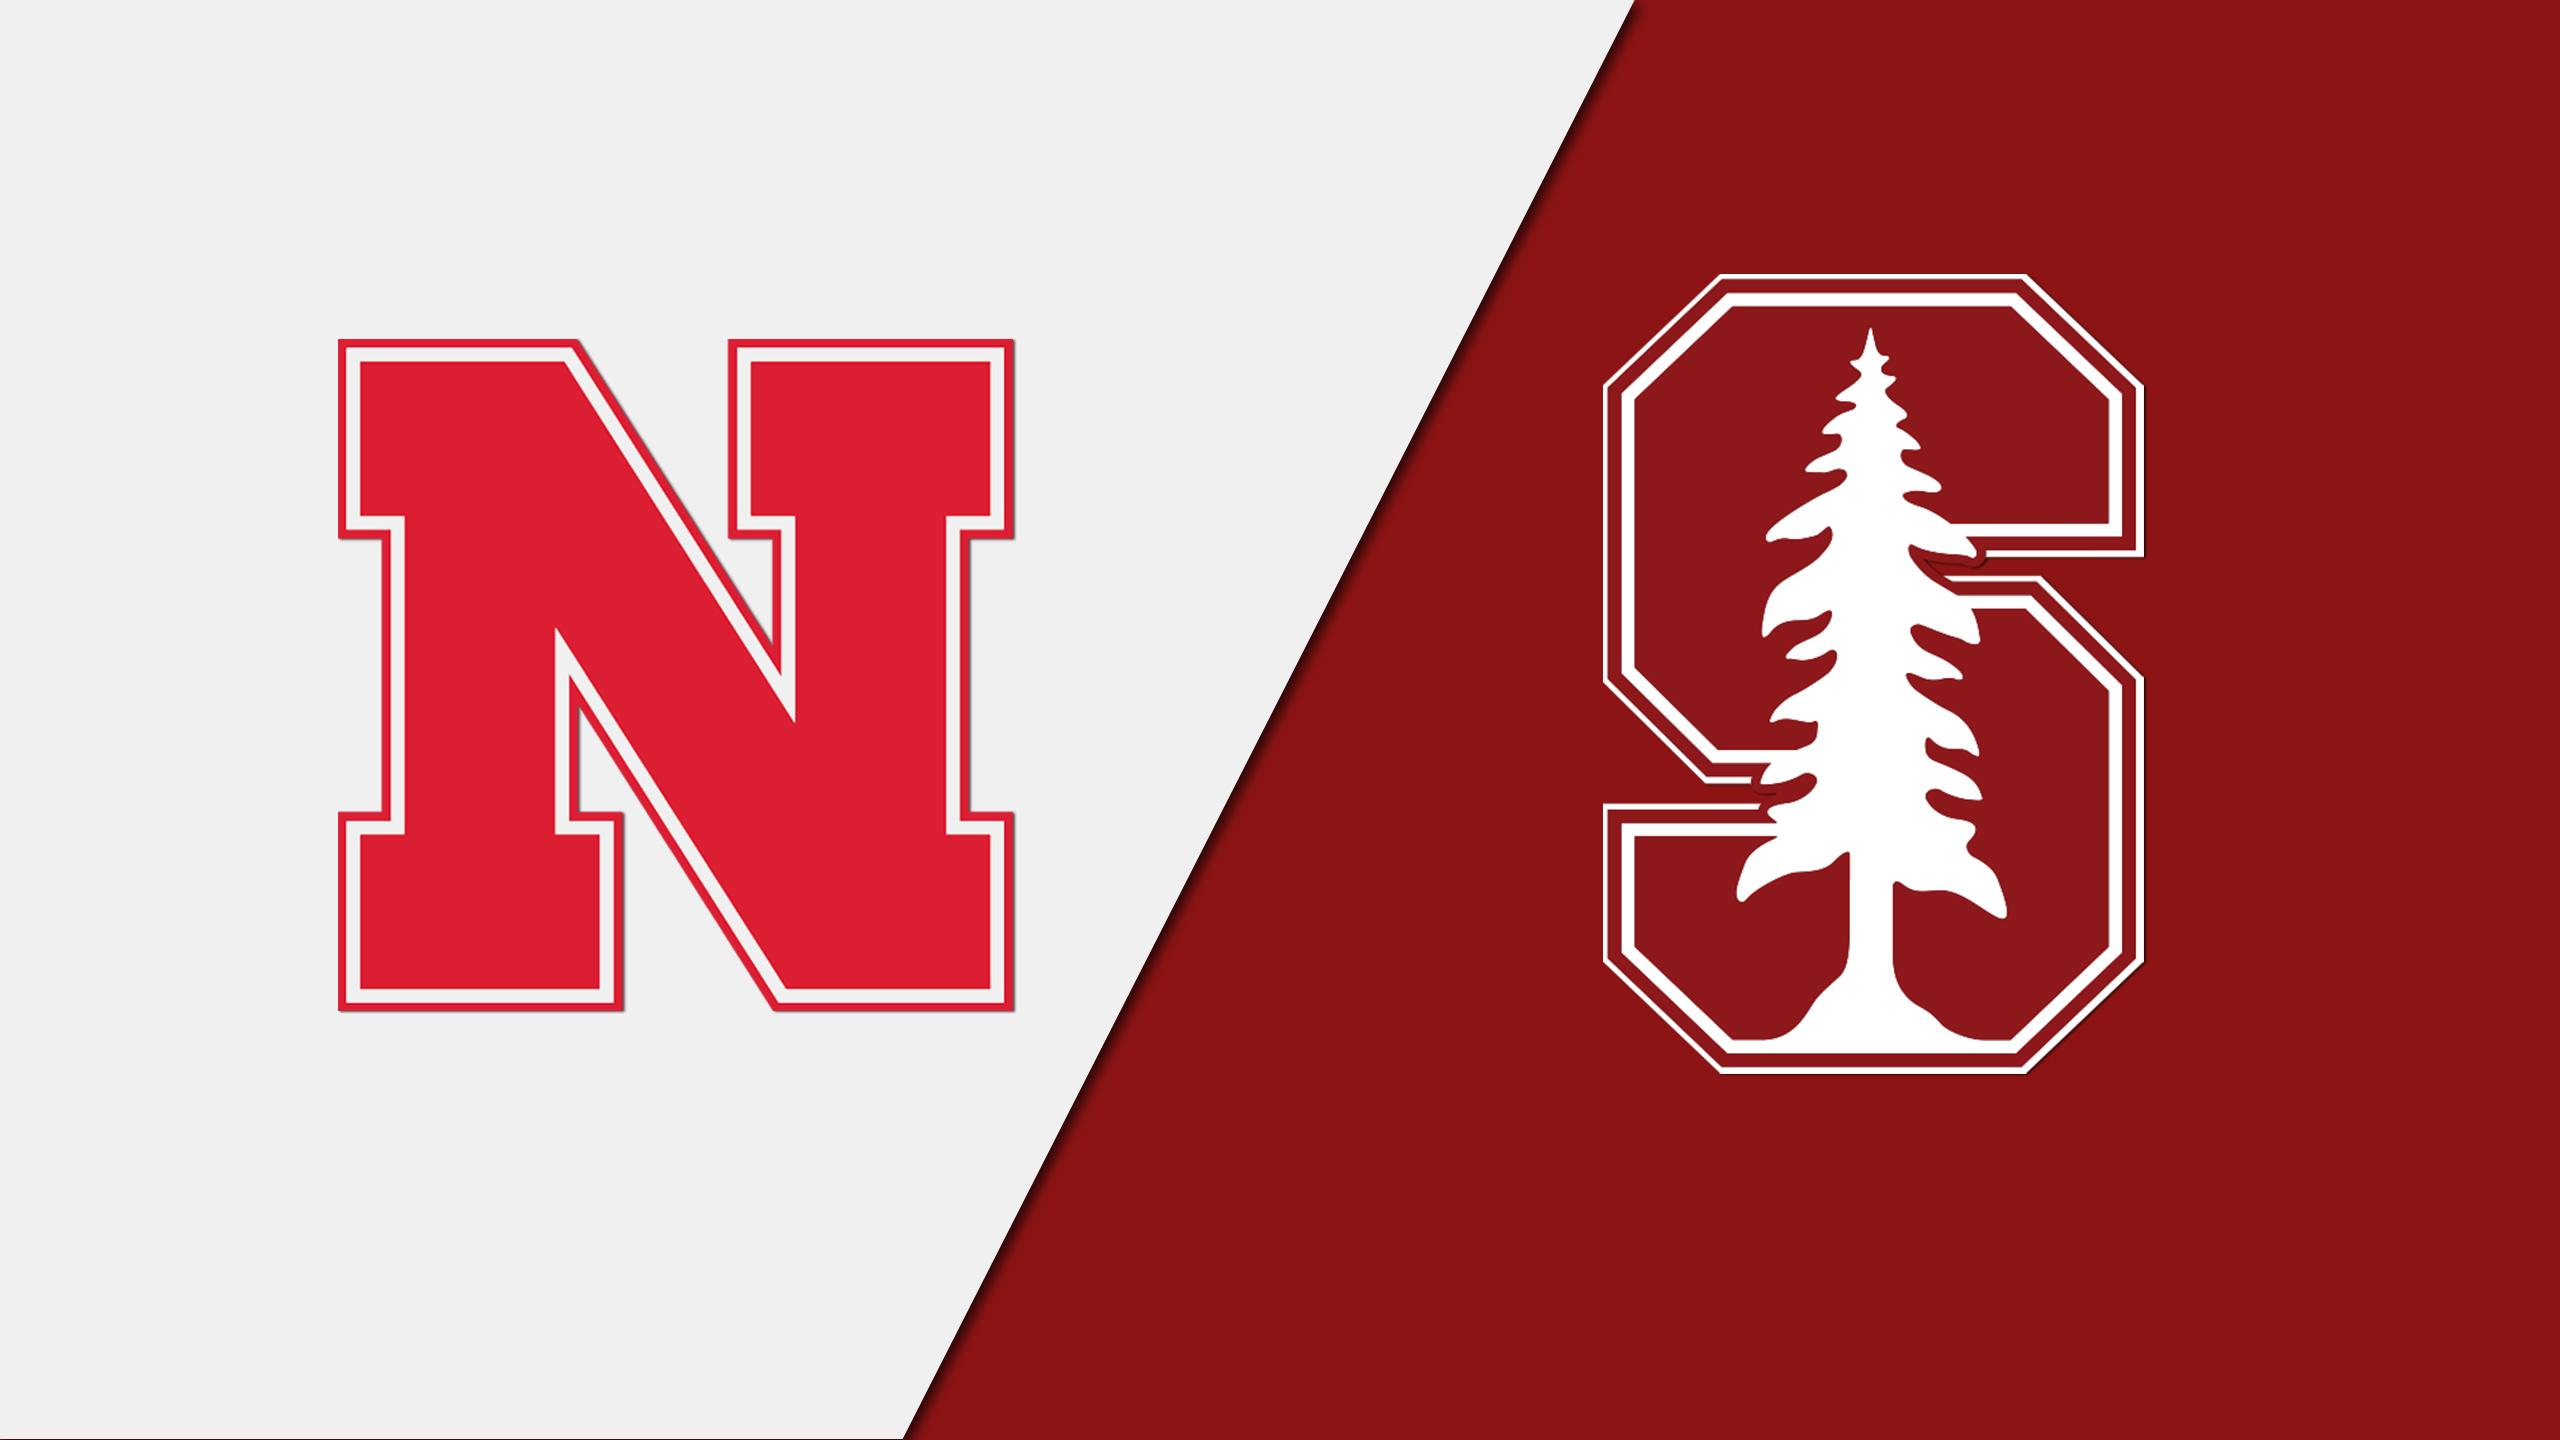 In Spanish - #7 Nebraska vs. #1 Stanford (Championship) (NCAA Division I Women's Volleyball Championship)